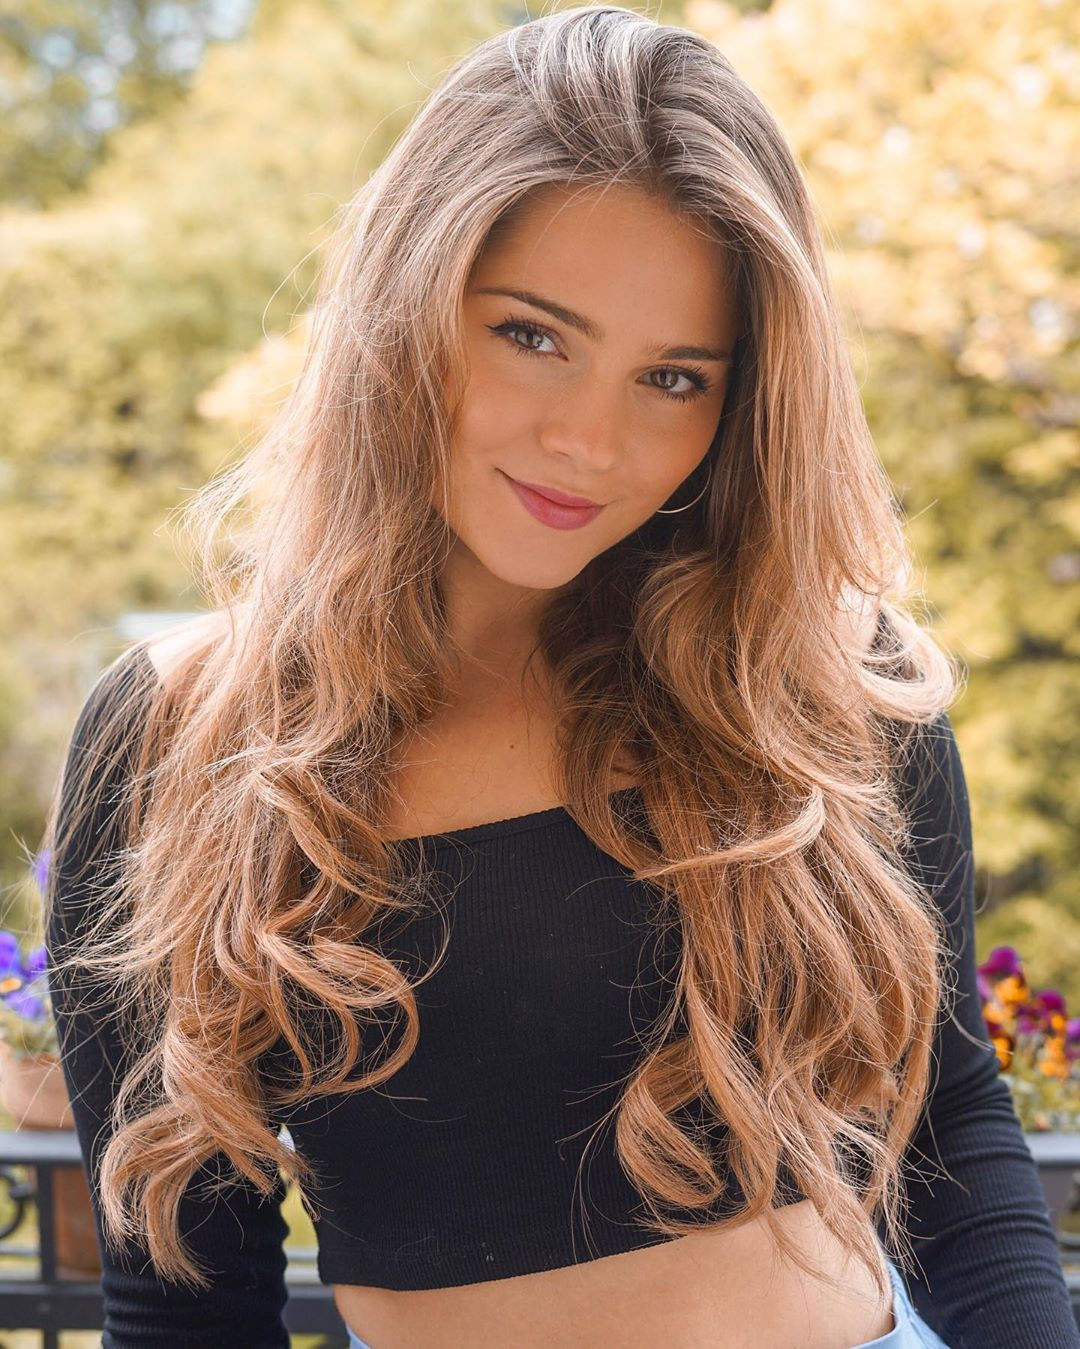 The most beautiful German girls | Pretty girls